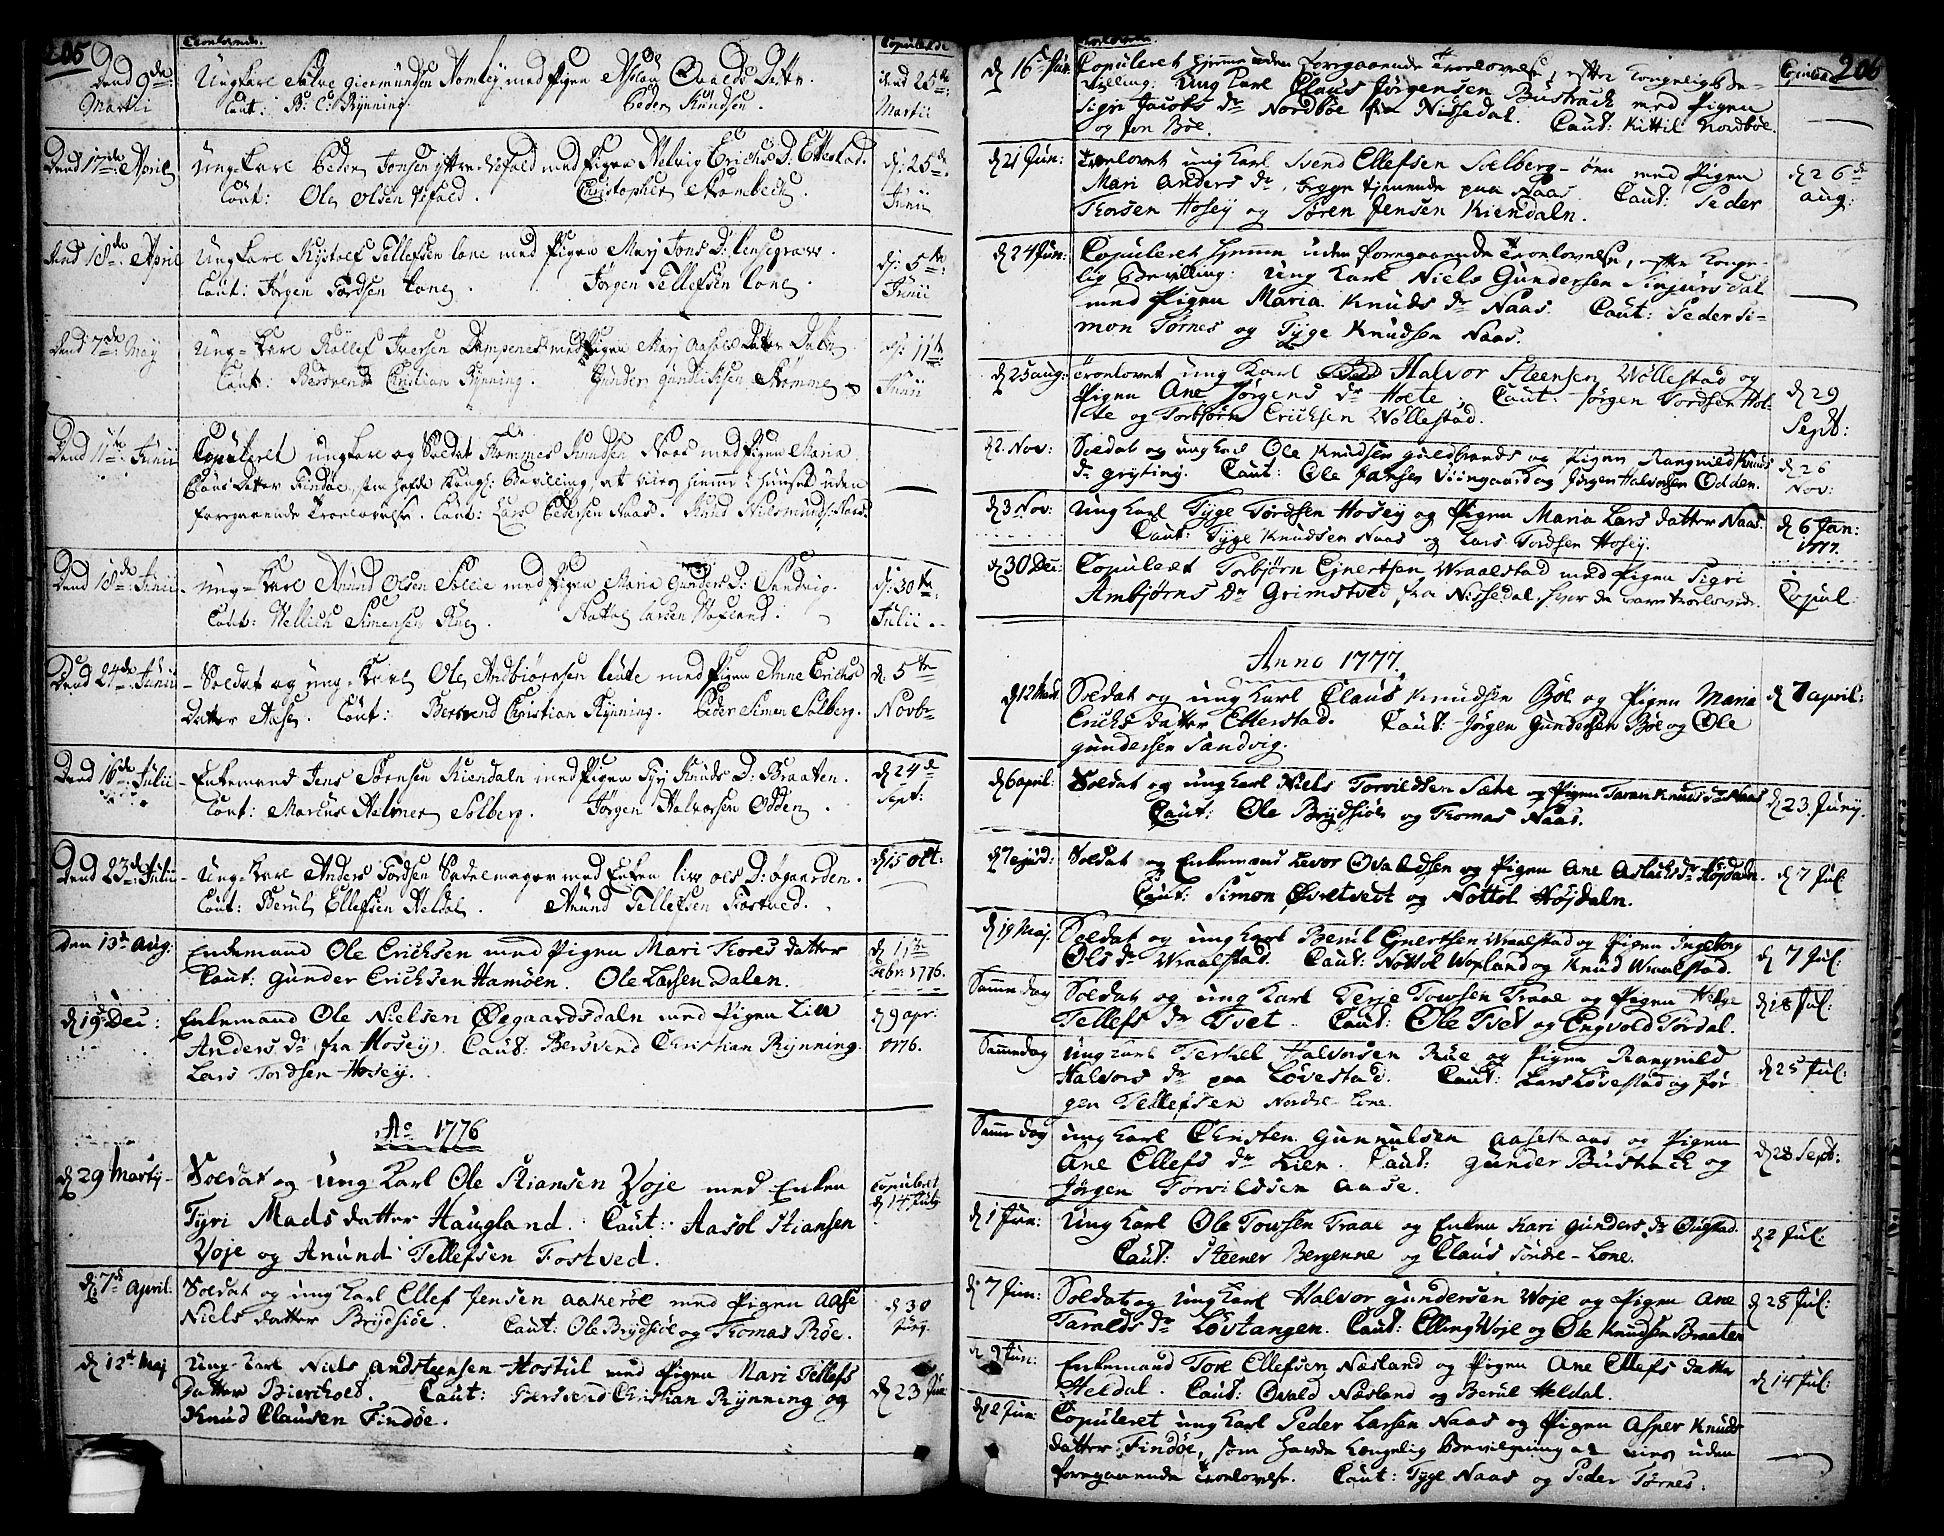 SAKO, Drangedal kirkebøker, F/Fa/L0003: Ministerialbok nr. 3, 1768-1814, s. 205-206